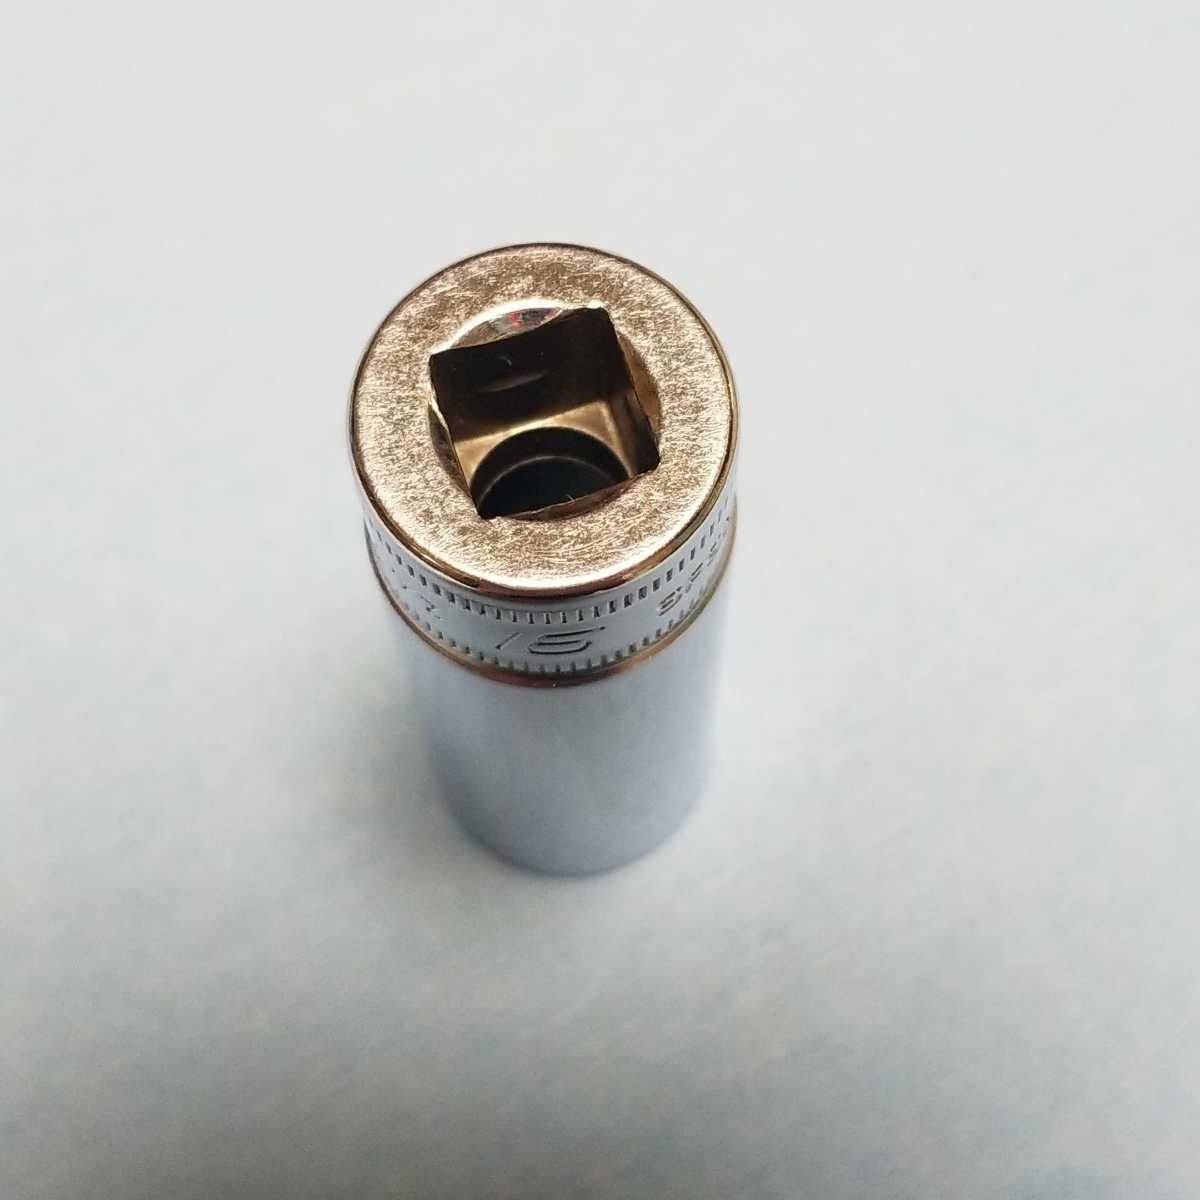 16mm 3/8 ディープ スナップオン SFSM16 (6角) 中古品 美品 保管品 SNAPON SNAP-ON ディープソケット ソケット 送料無料 Snap-on _画像7